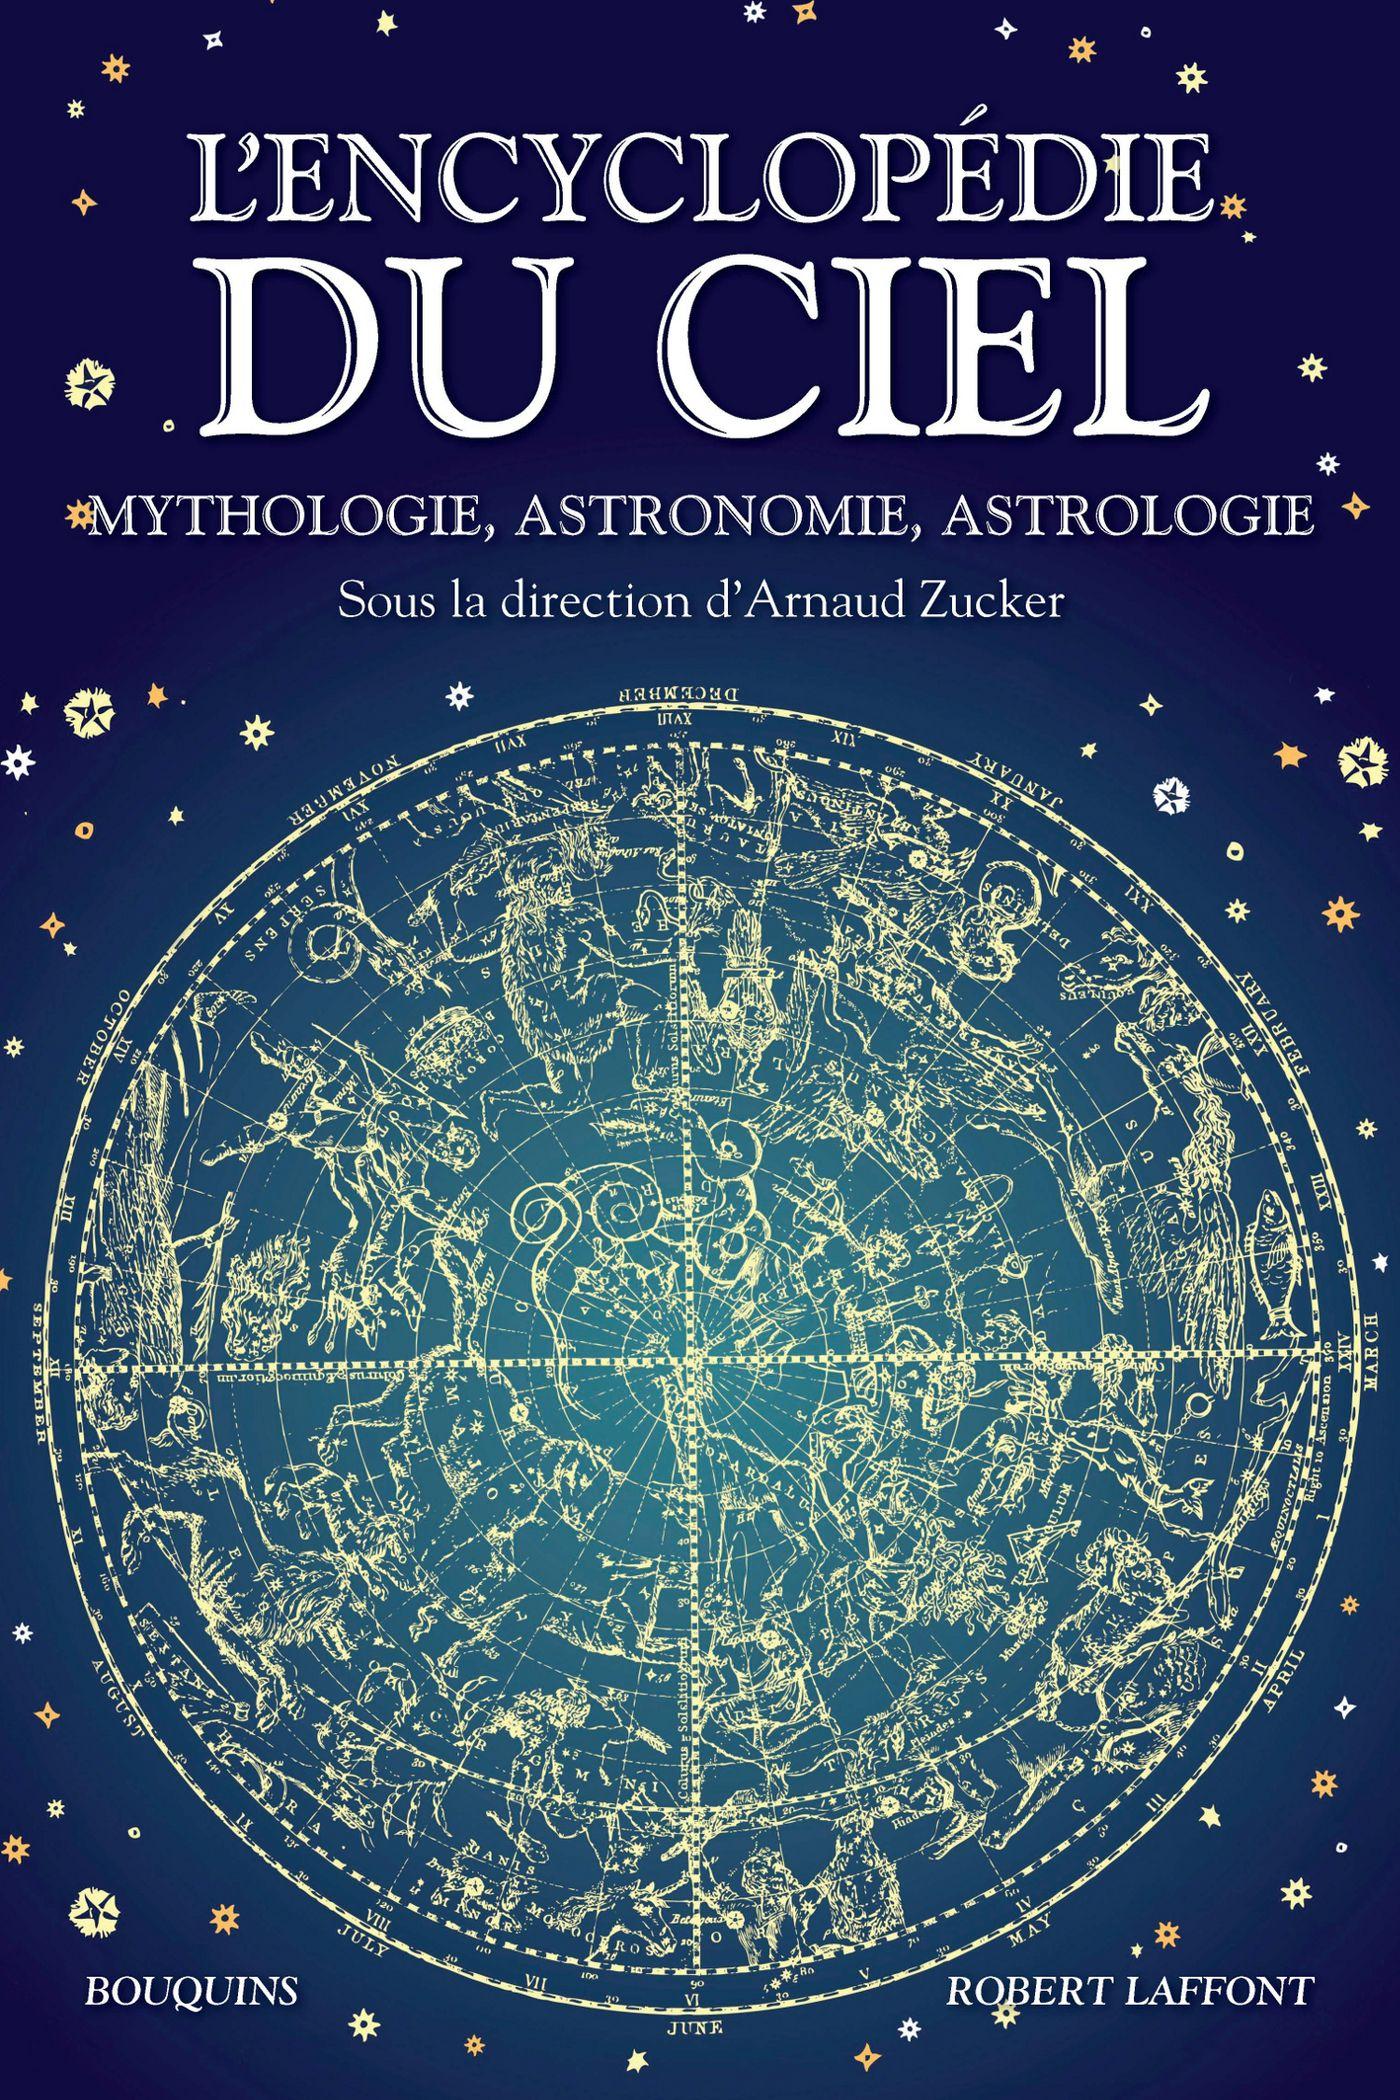 L Encyclopedie Du Ciel Mythologie Astronomie Astrologie Sous La Direction De D Arnaud Zucker Editions Robert Laffont 4 Ciel Lockscreen Ebook